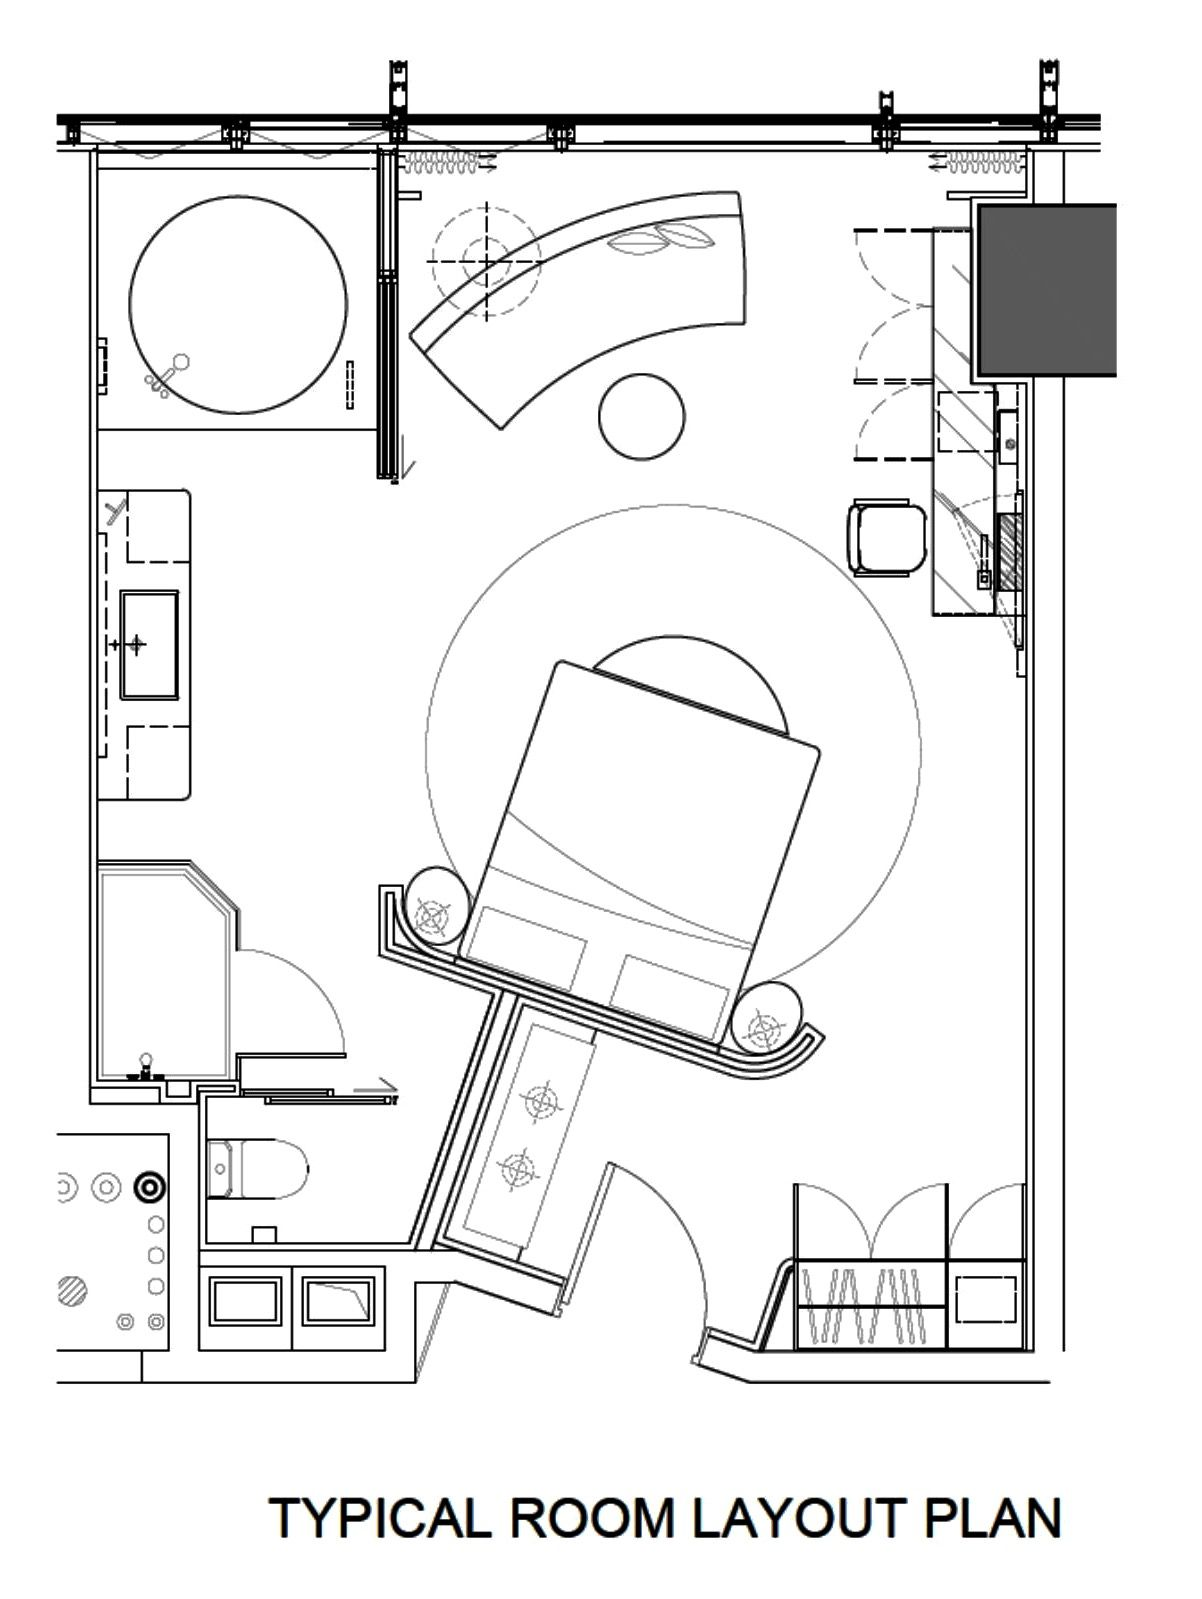 Hard Rock Hotel Shenzhen By Cl3 Architects Hotel Arquitectura Plano Hotel Interiores De Hoteles